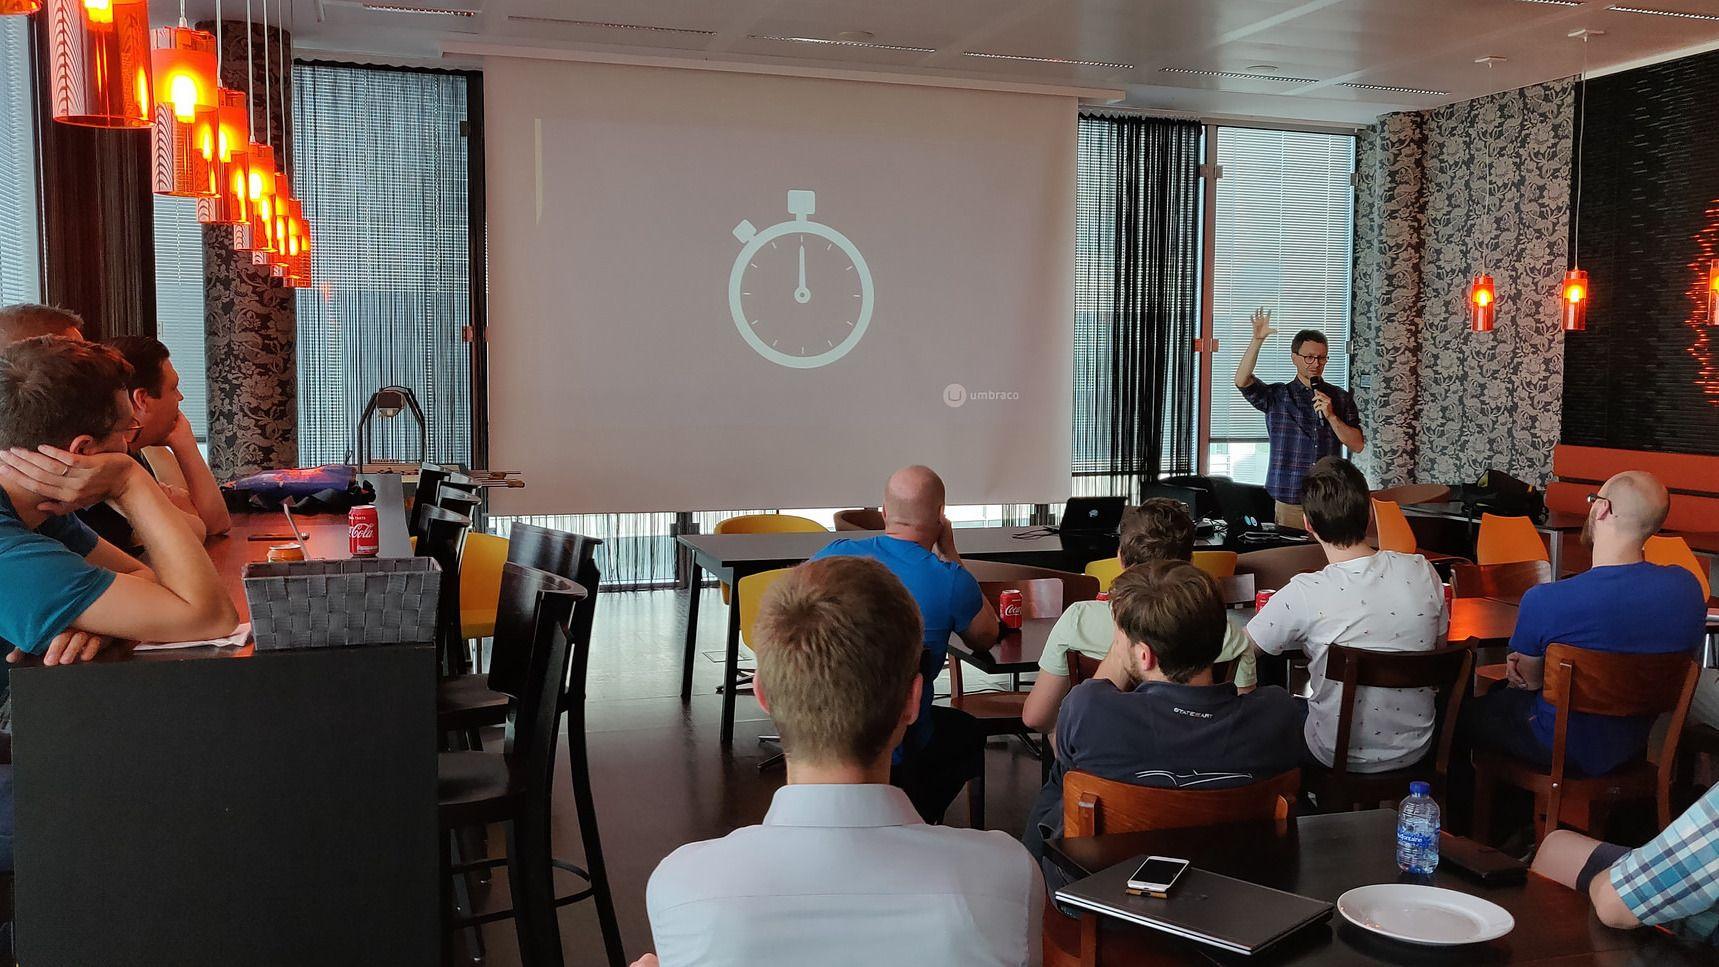 Belgian Umbraco User Group Meetup